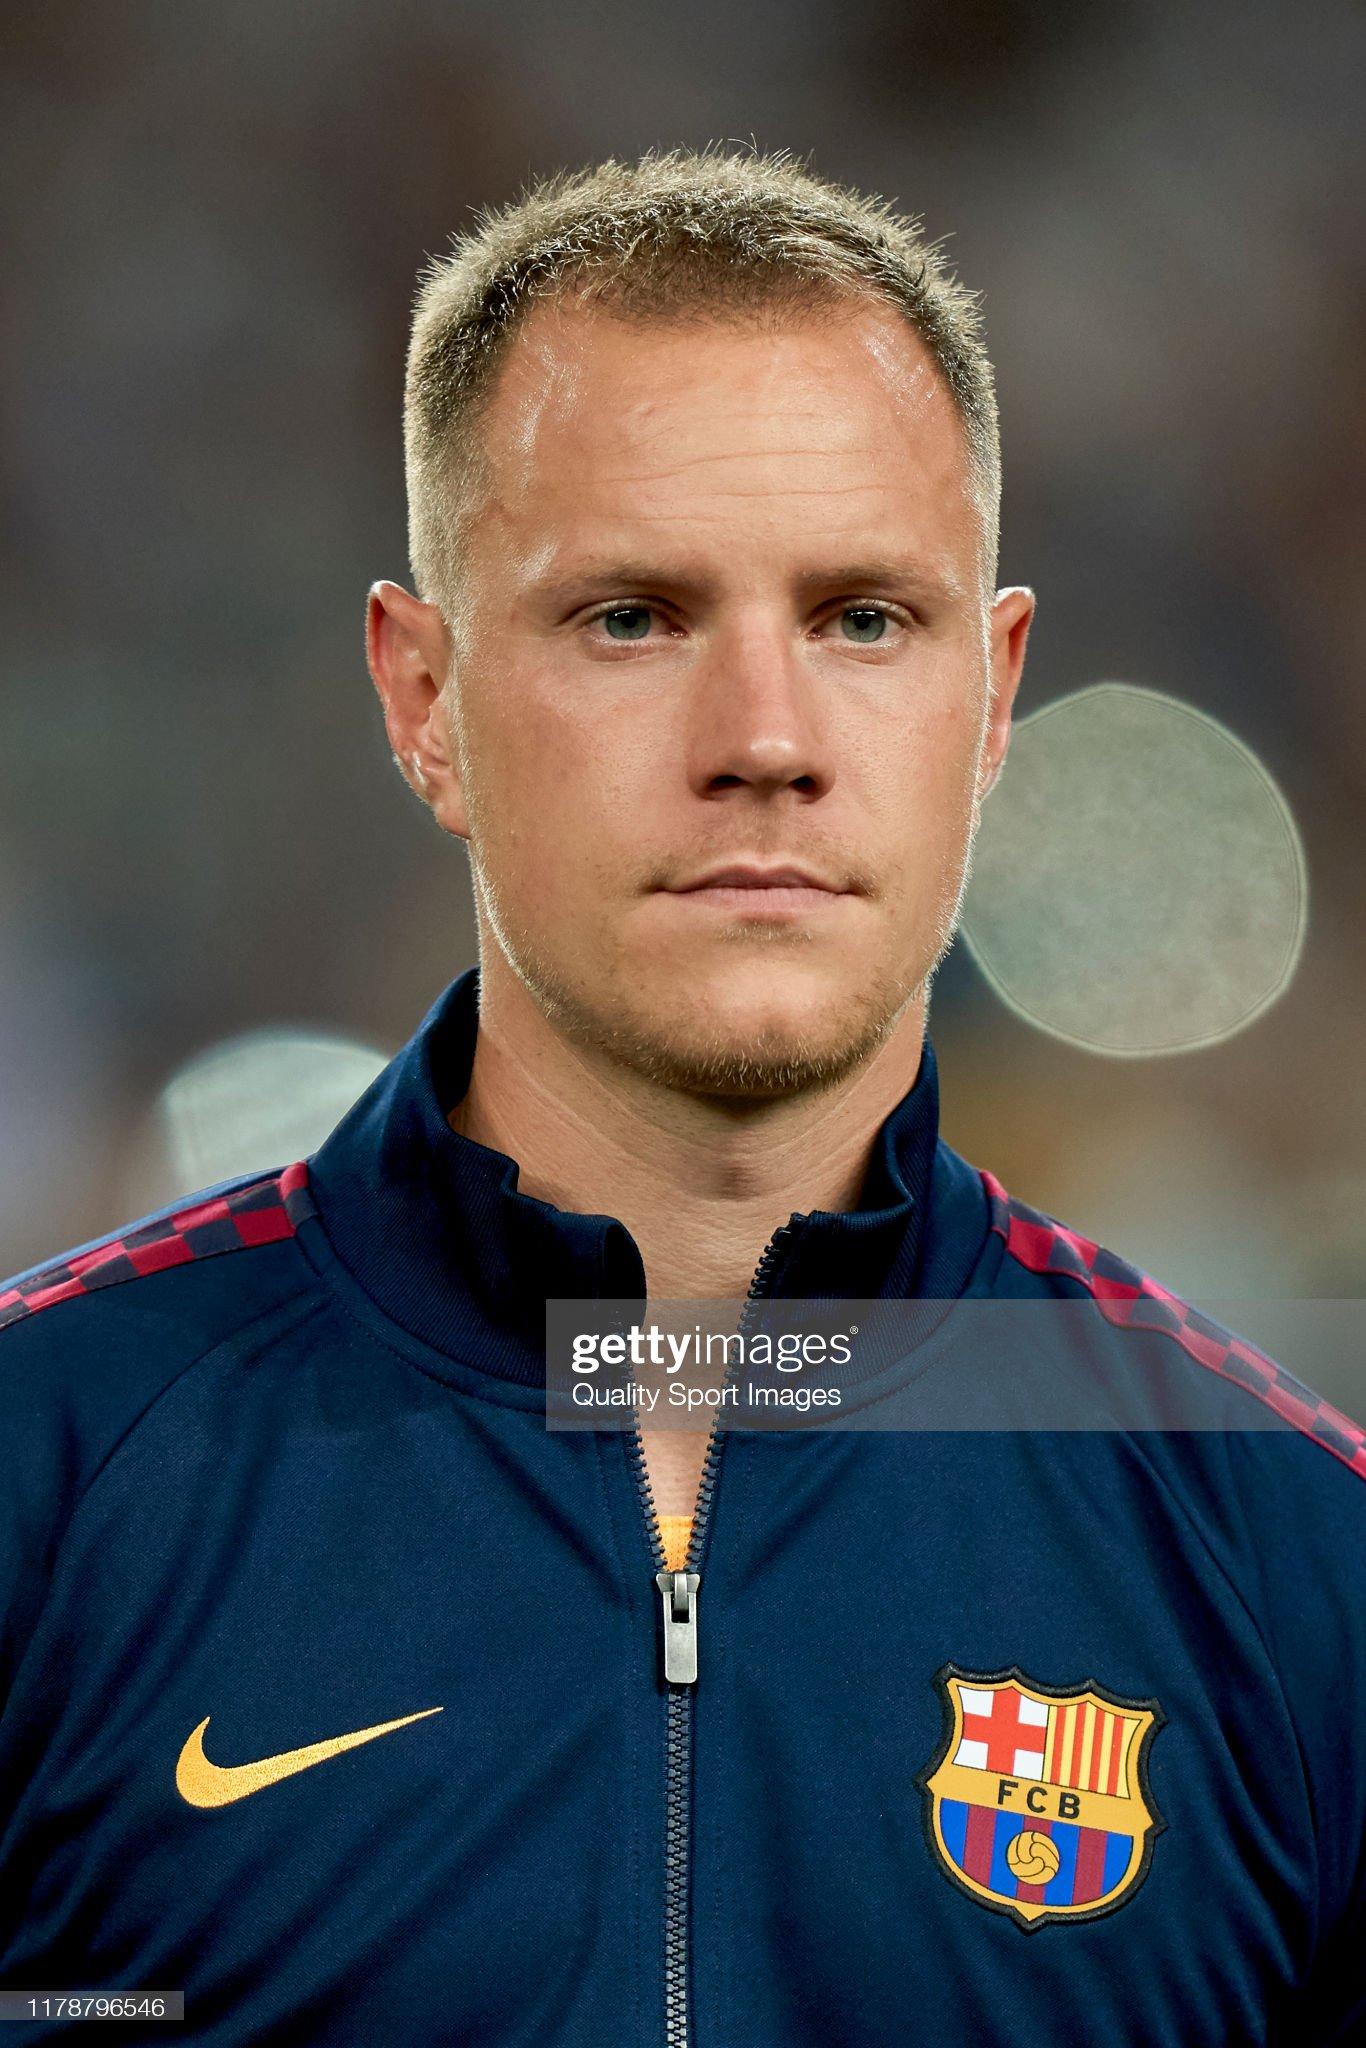 صور مباراة : برشلونة - إنتر 2-1 ( 02-10-2019 )  Marc-andre-ter-stegen-of-fc-barcelona-looks-on-prior-to-the-uefa-f-picture-id1178796546?s=2048x2048